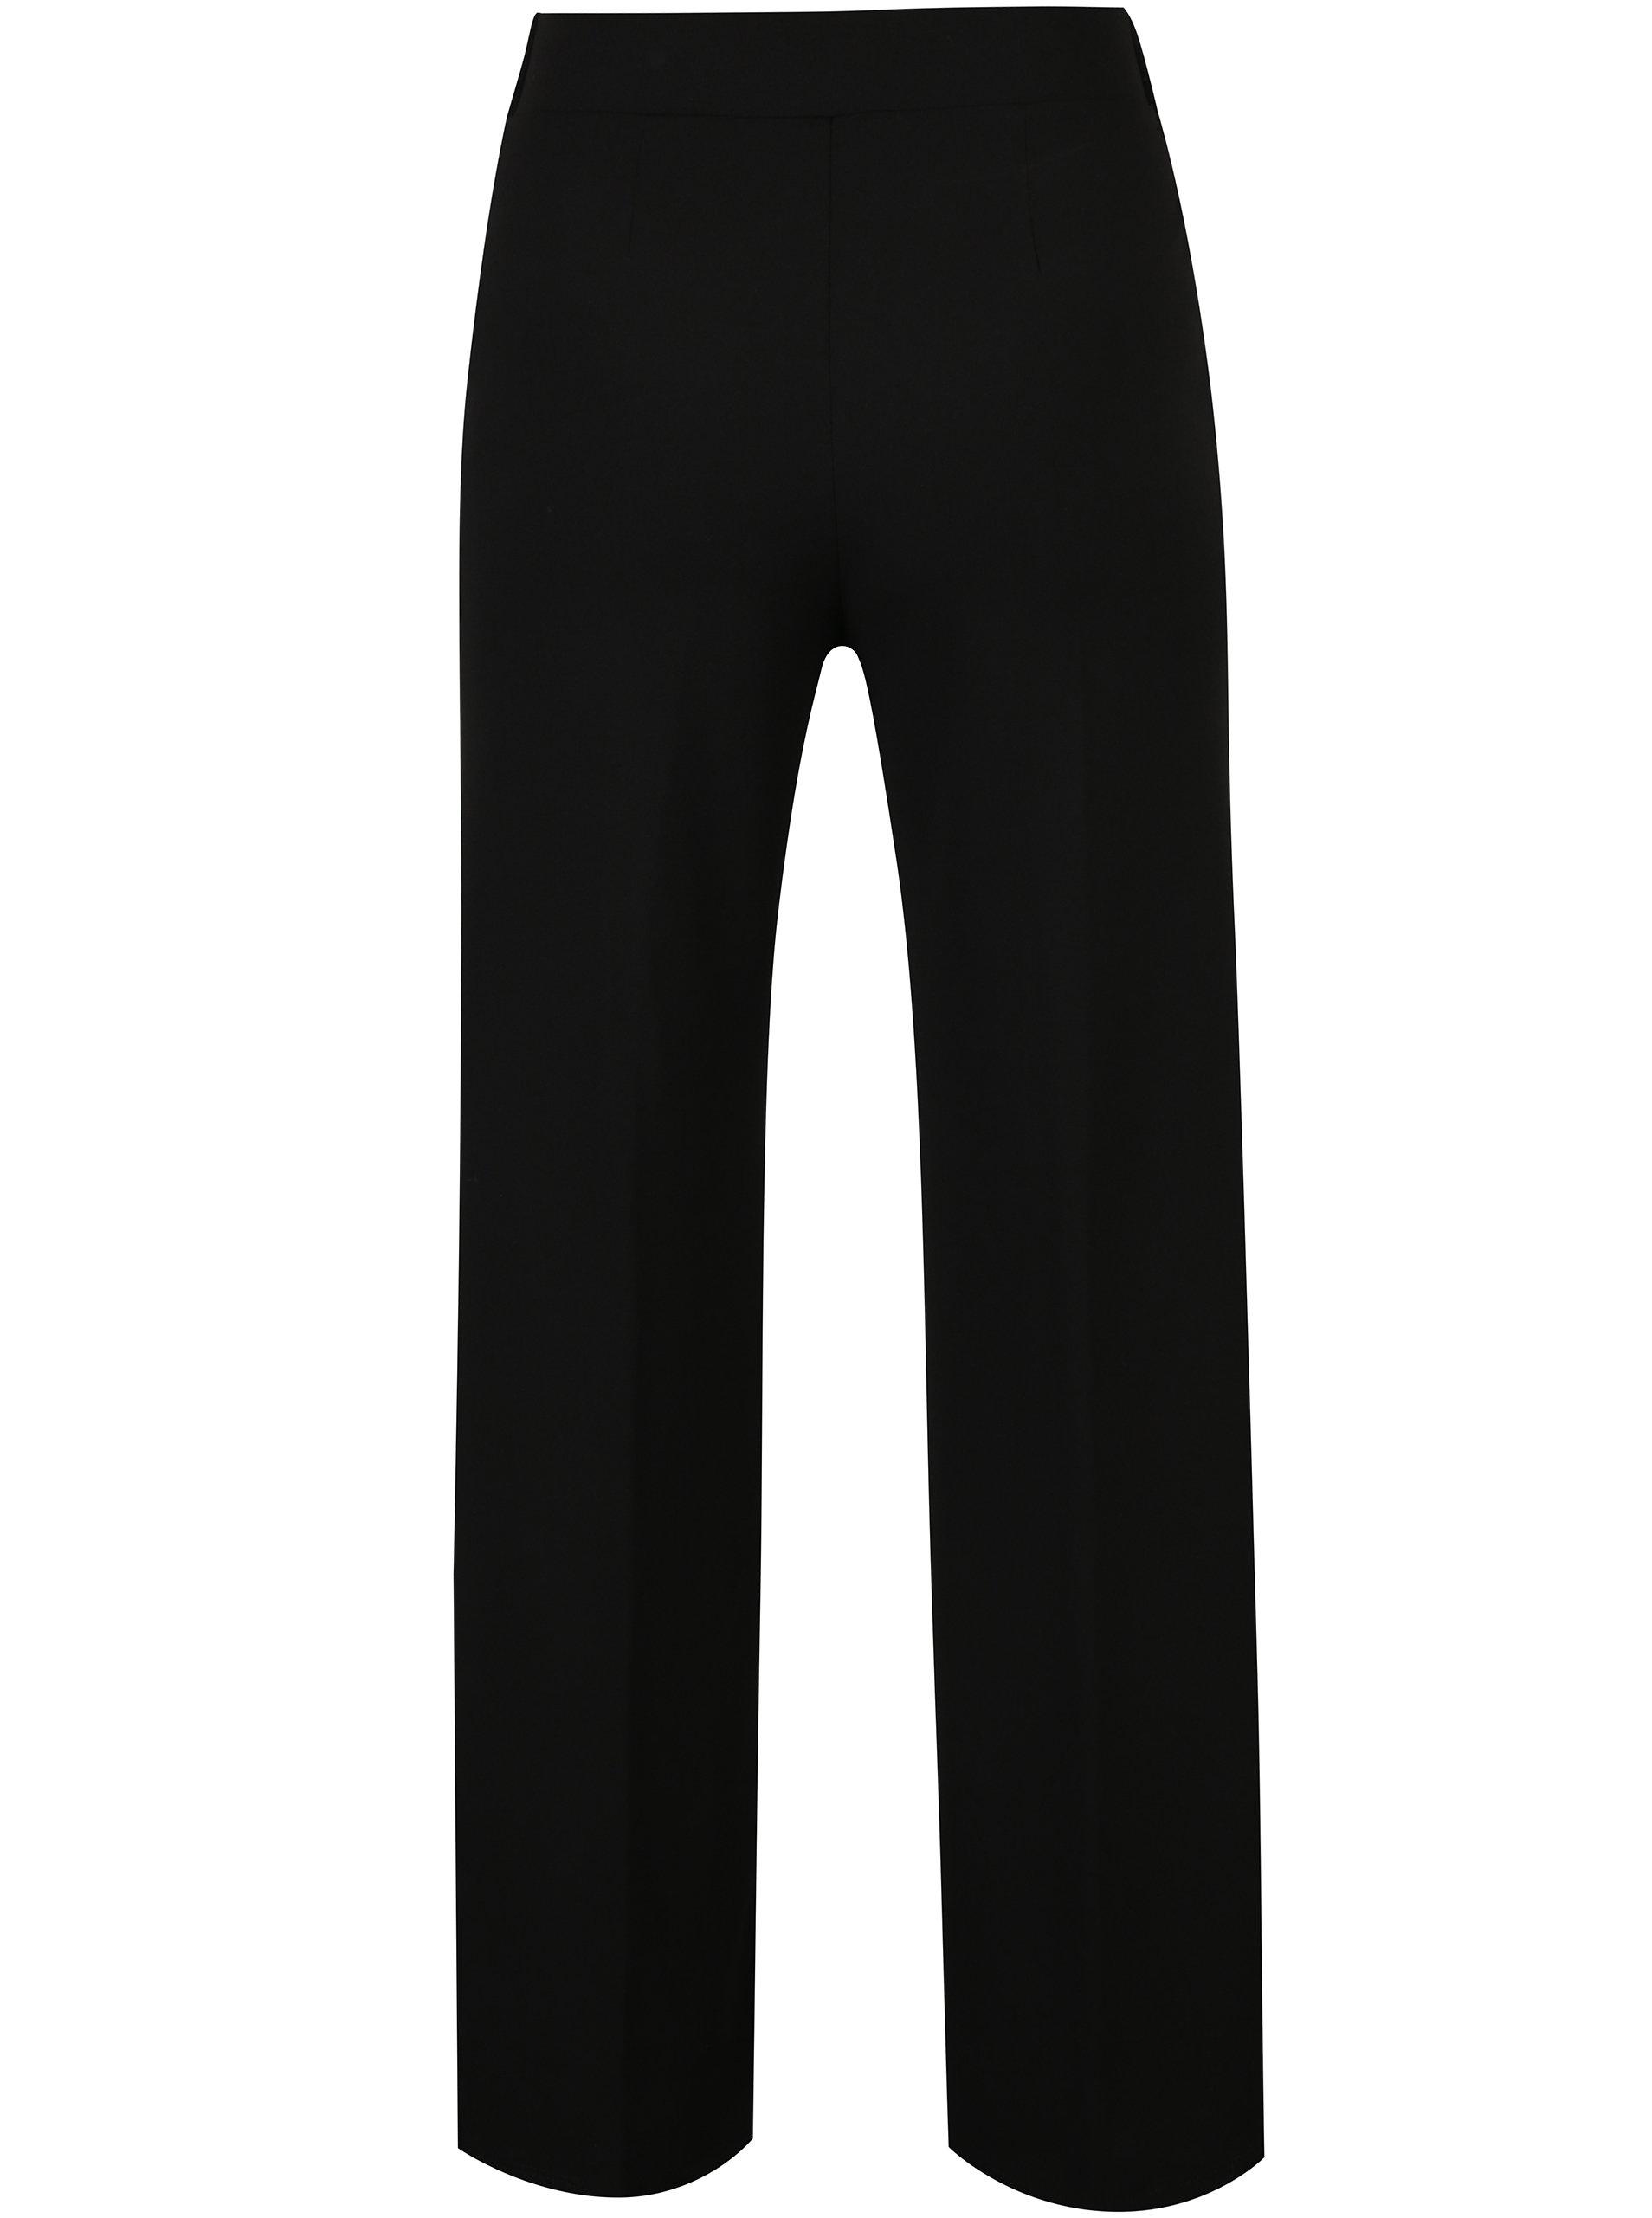 73d63b002b3 Černé široké kalhoty Miss Selfridge Petites ...